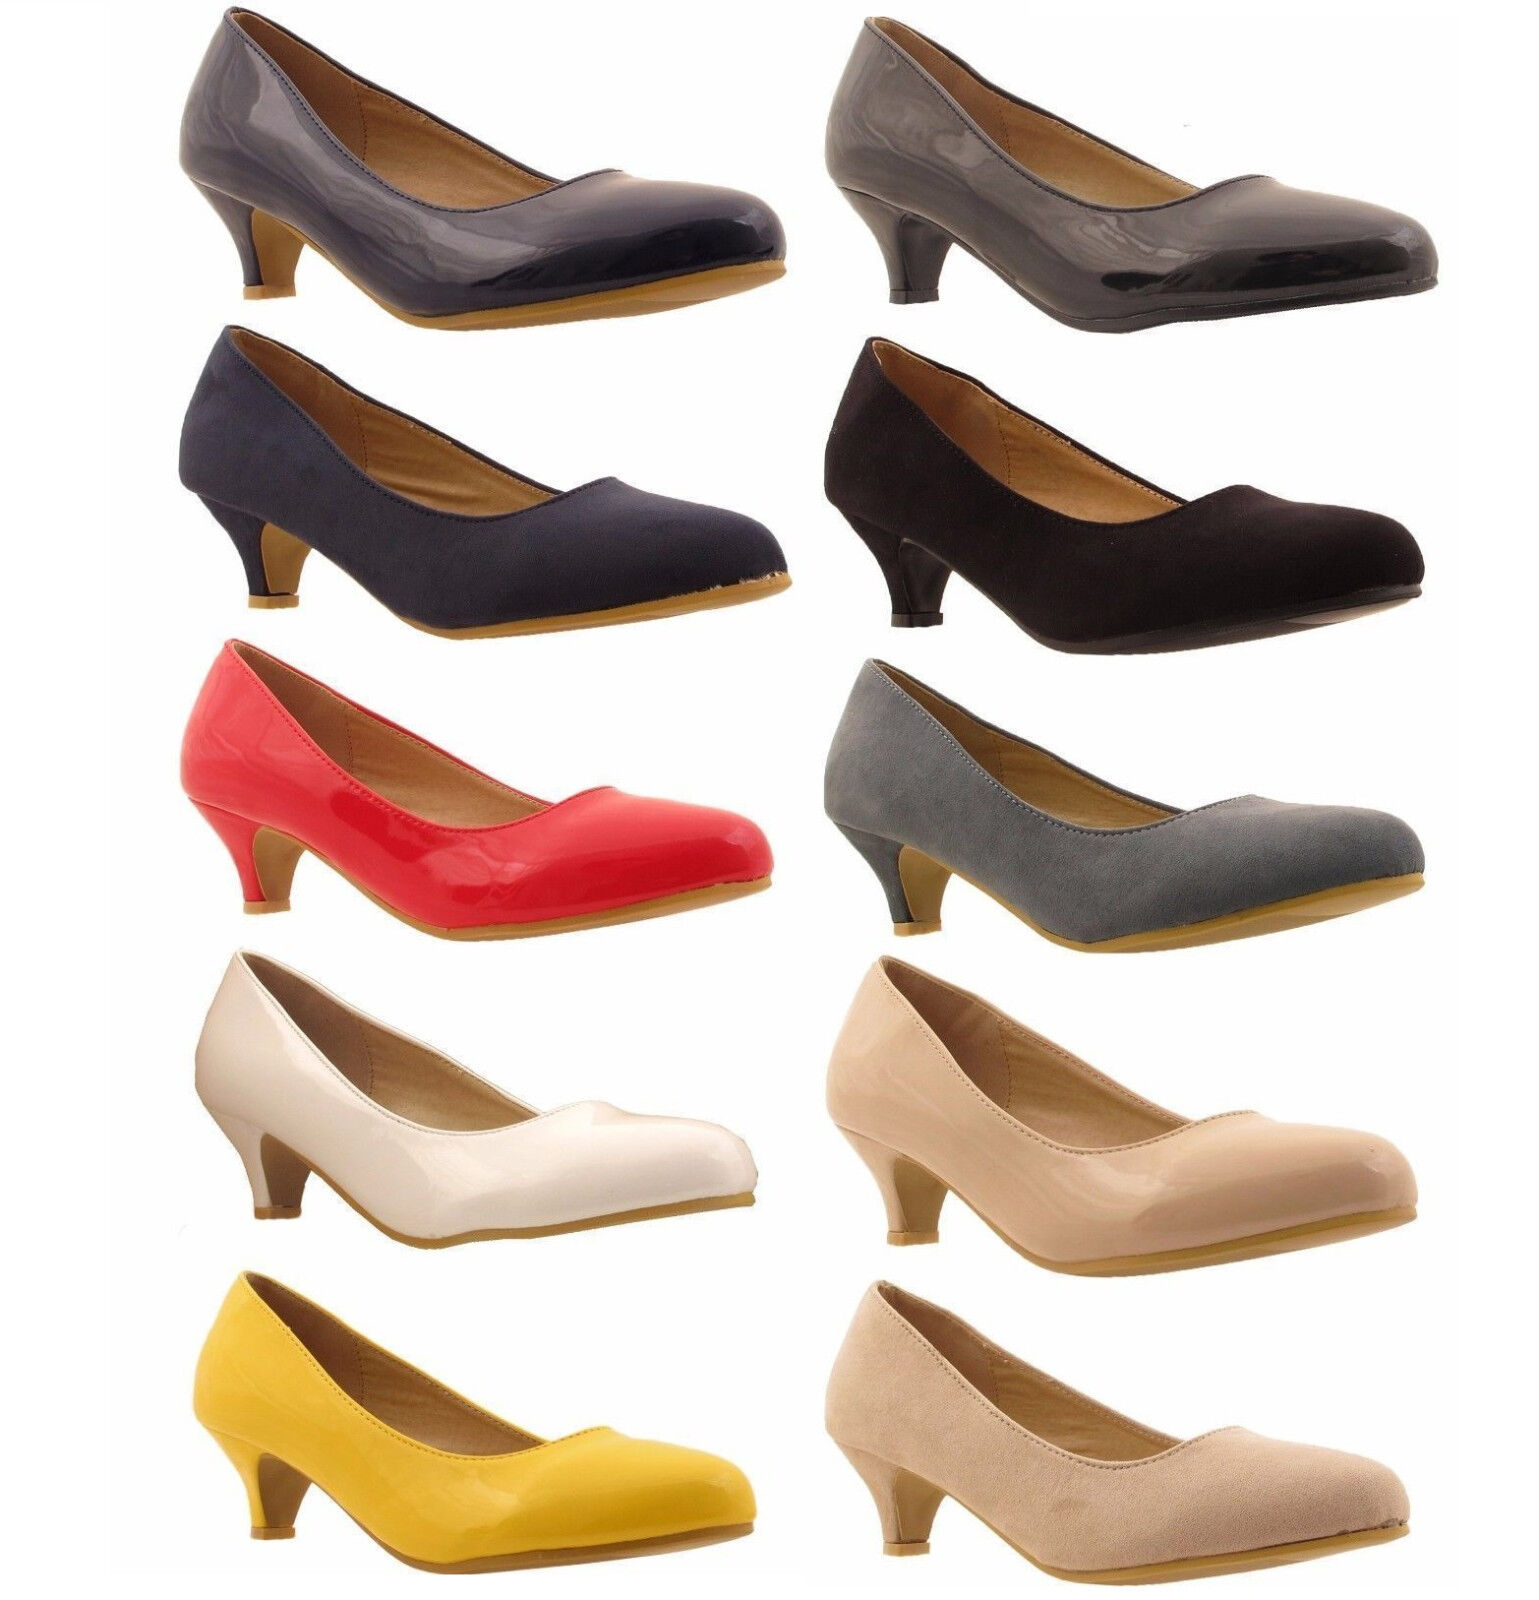 New Ladies Womens Low Kitten Heel Work Court Evening Girls Shoes Pumps Size 3-8